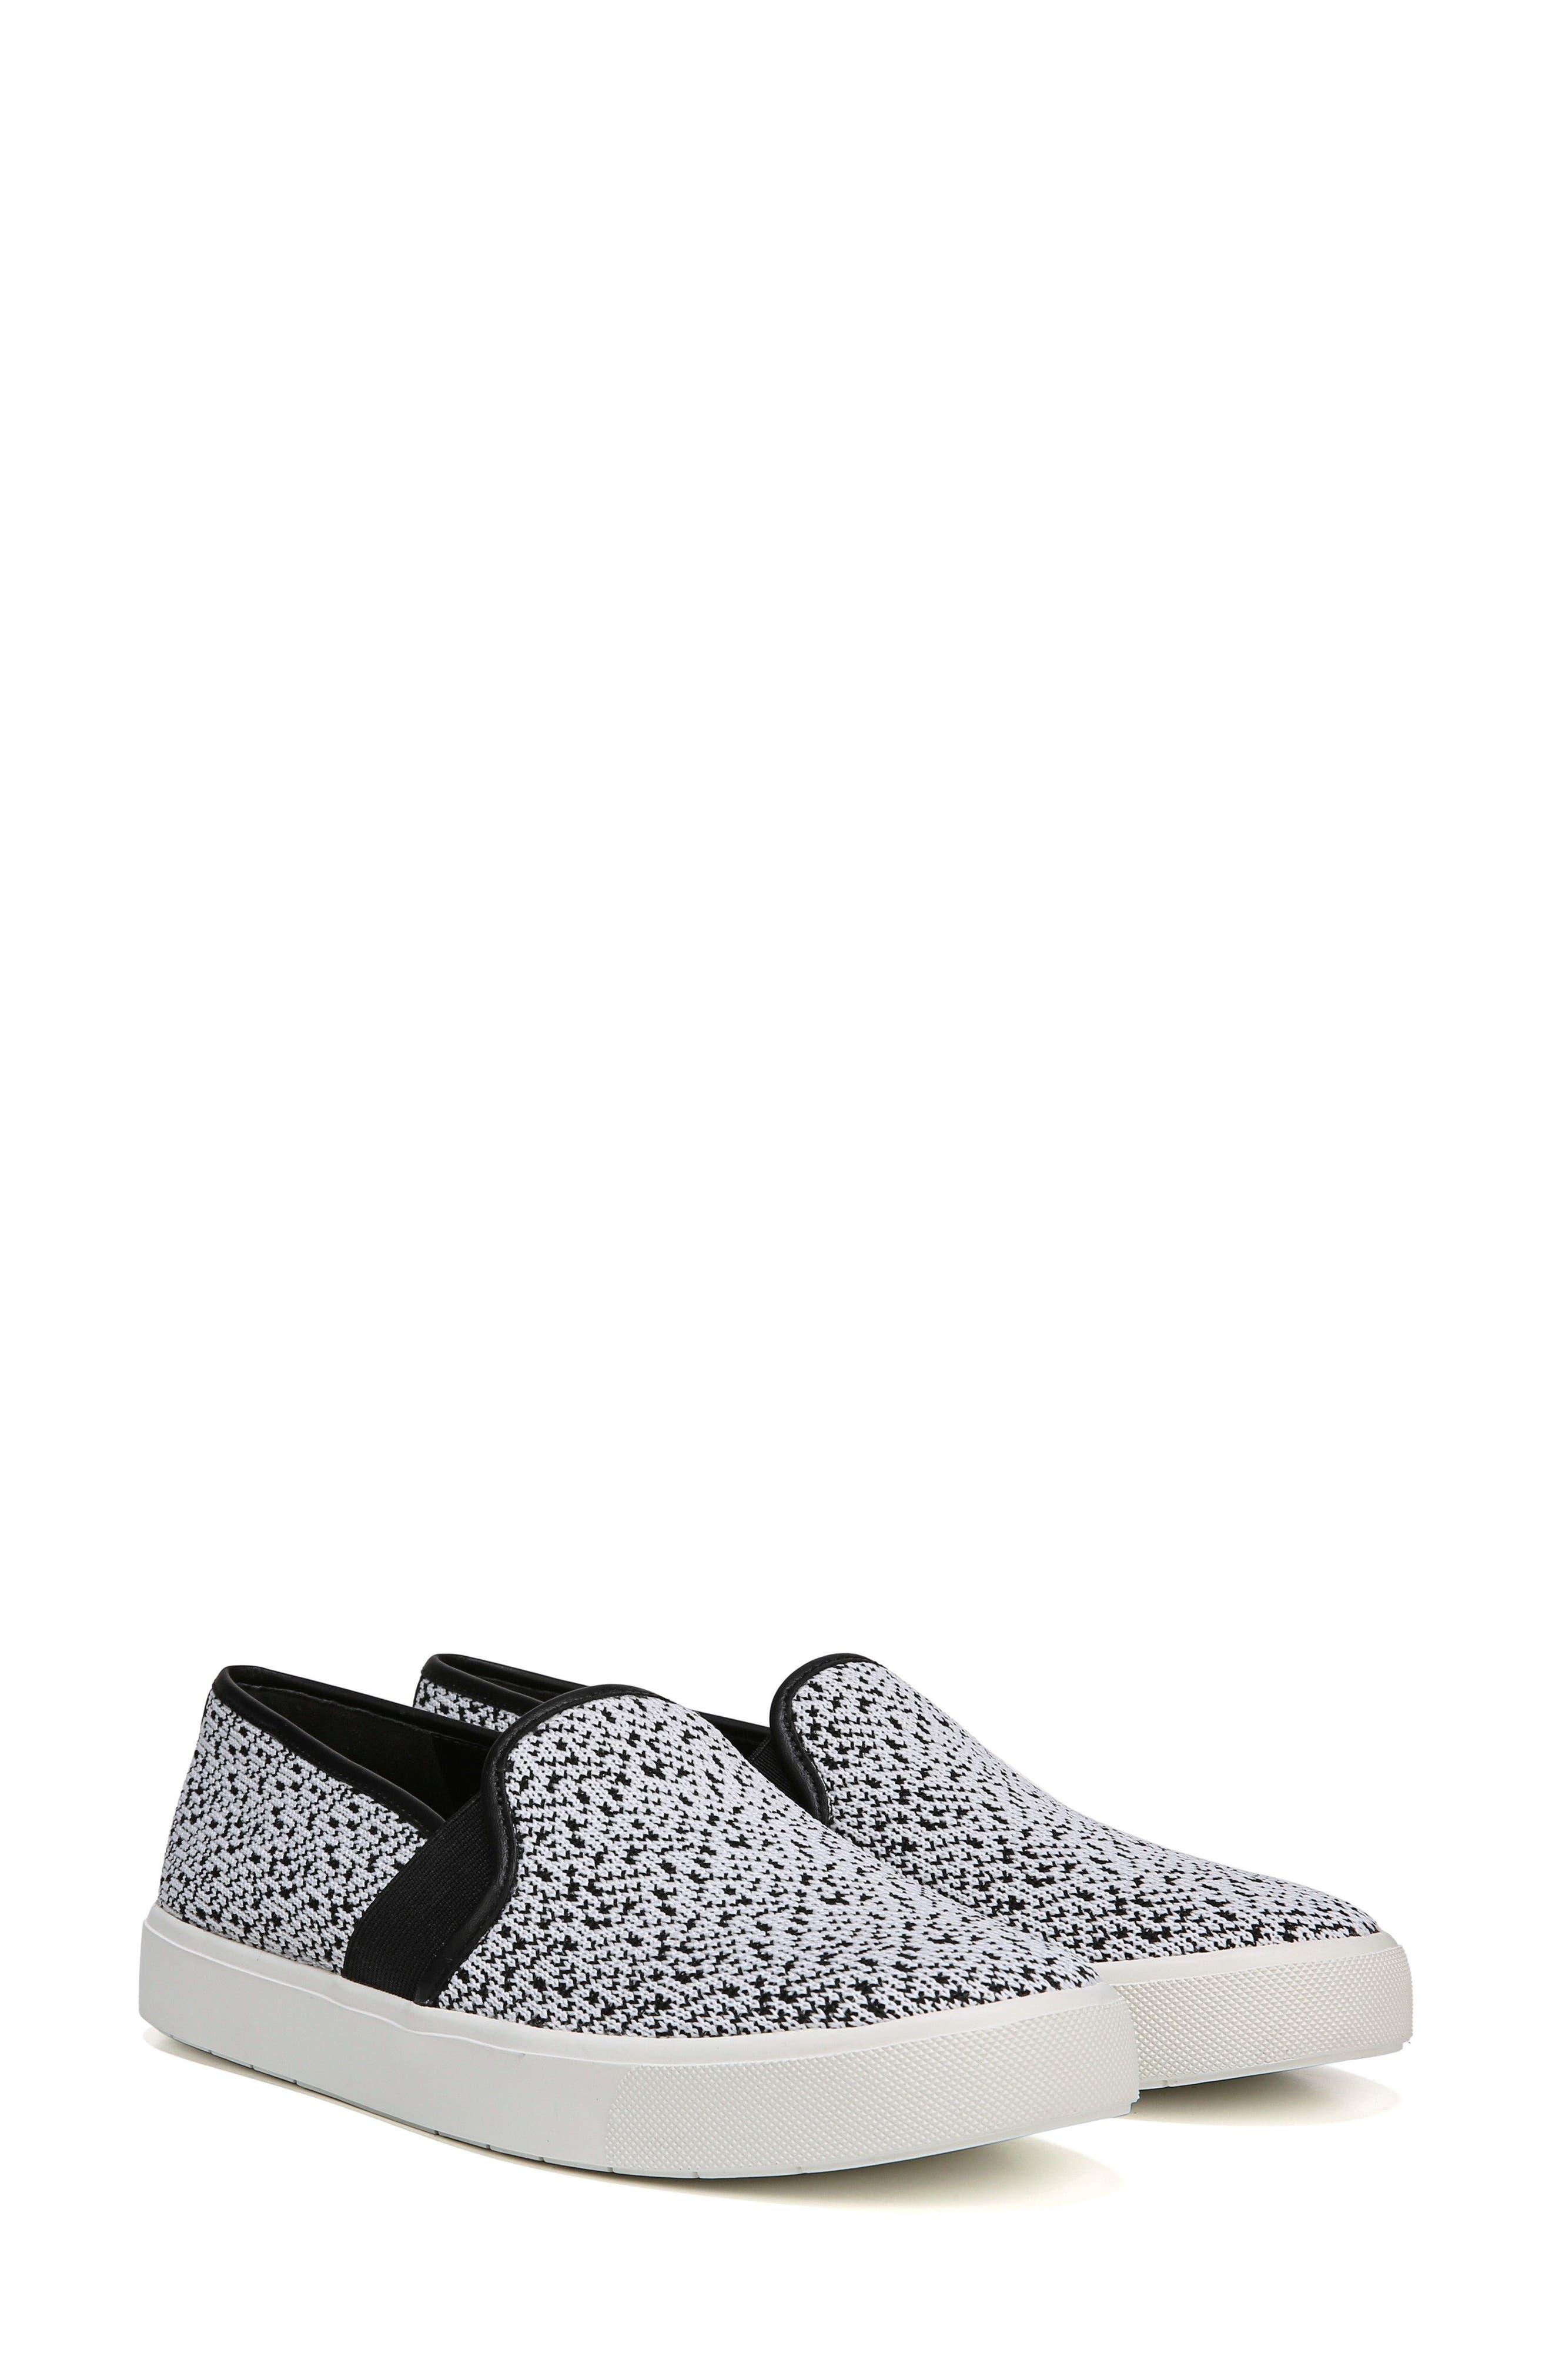 'Blair 12' Leather Slip-On Sneaker,                             Alternate thumbnail 6, color,                             WHITE/ BLACK YETI KNIT